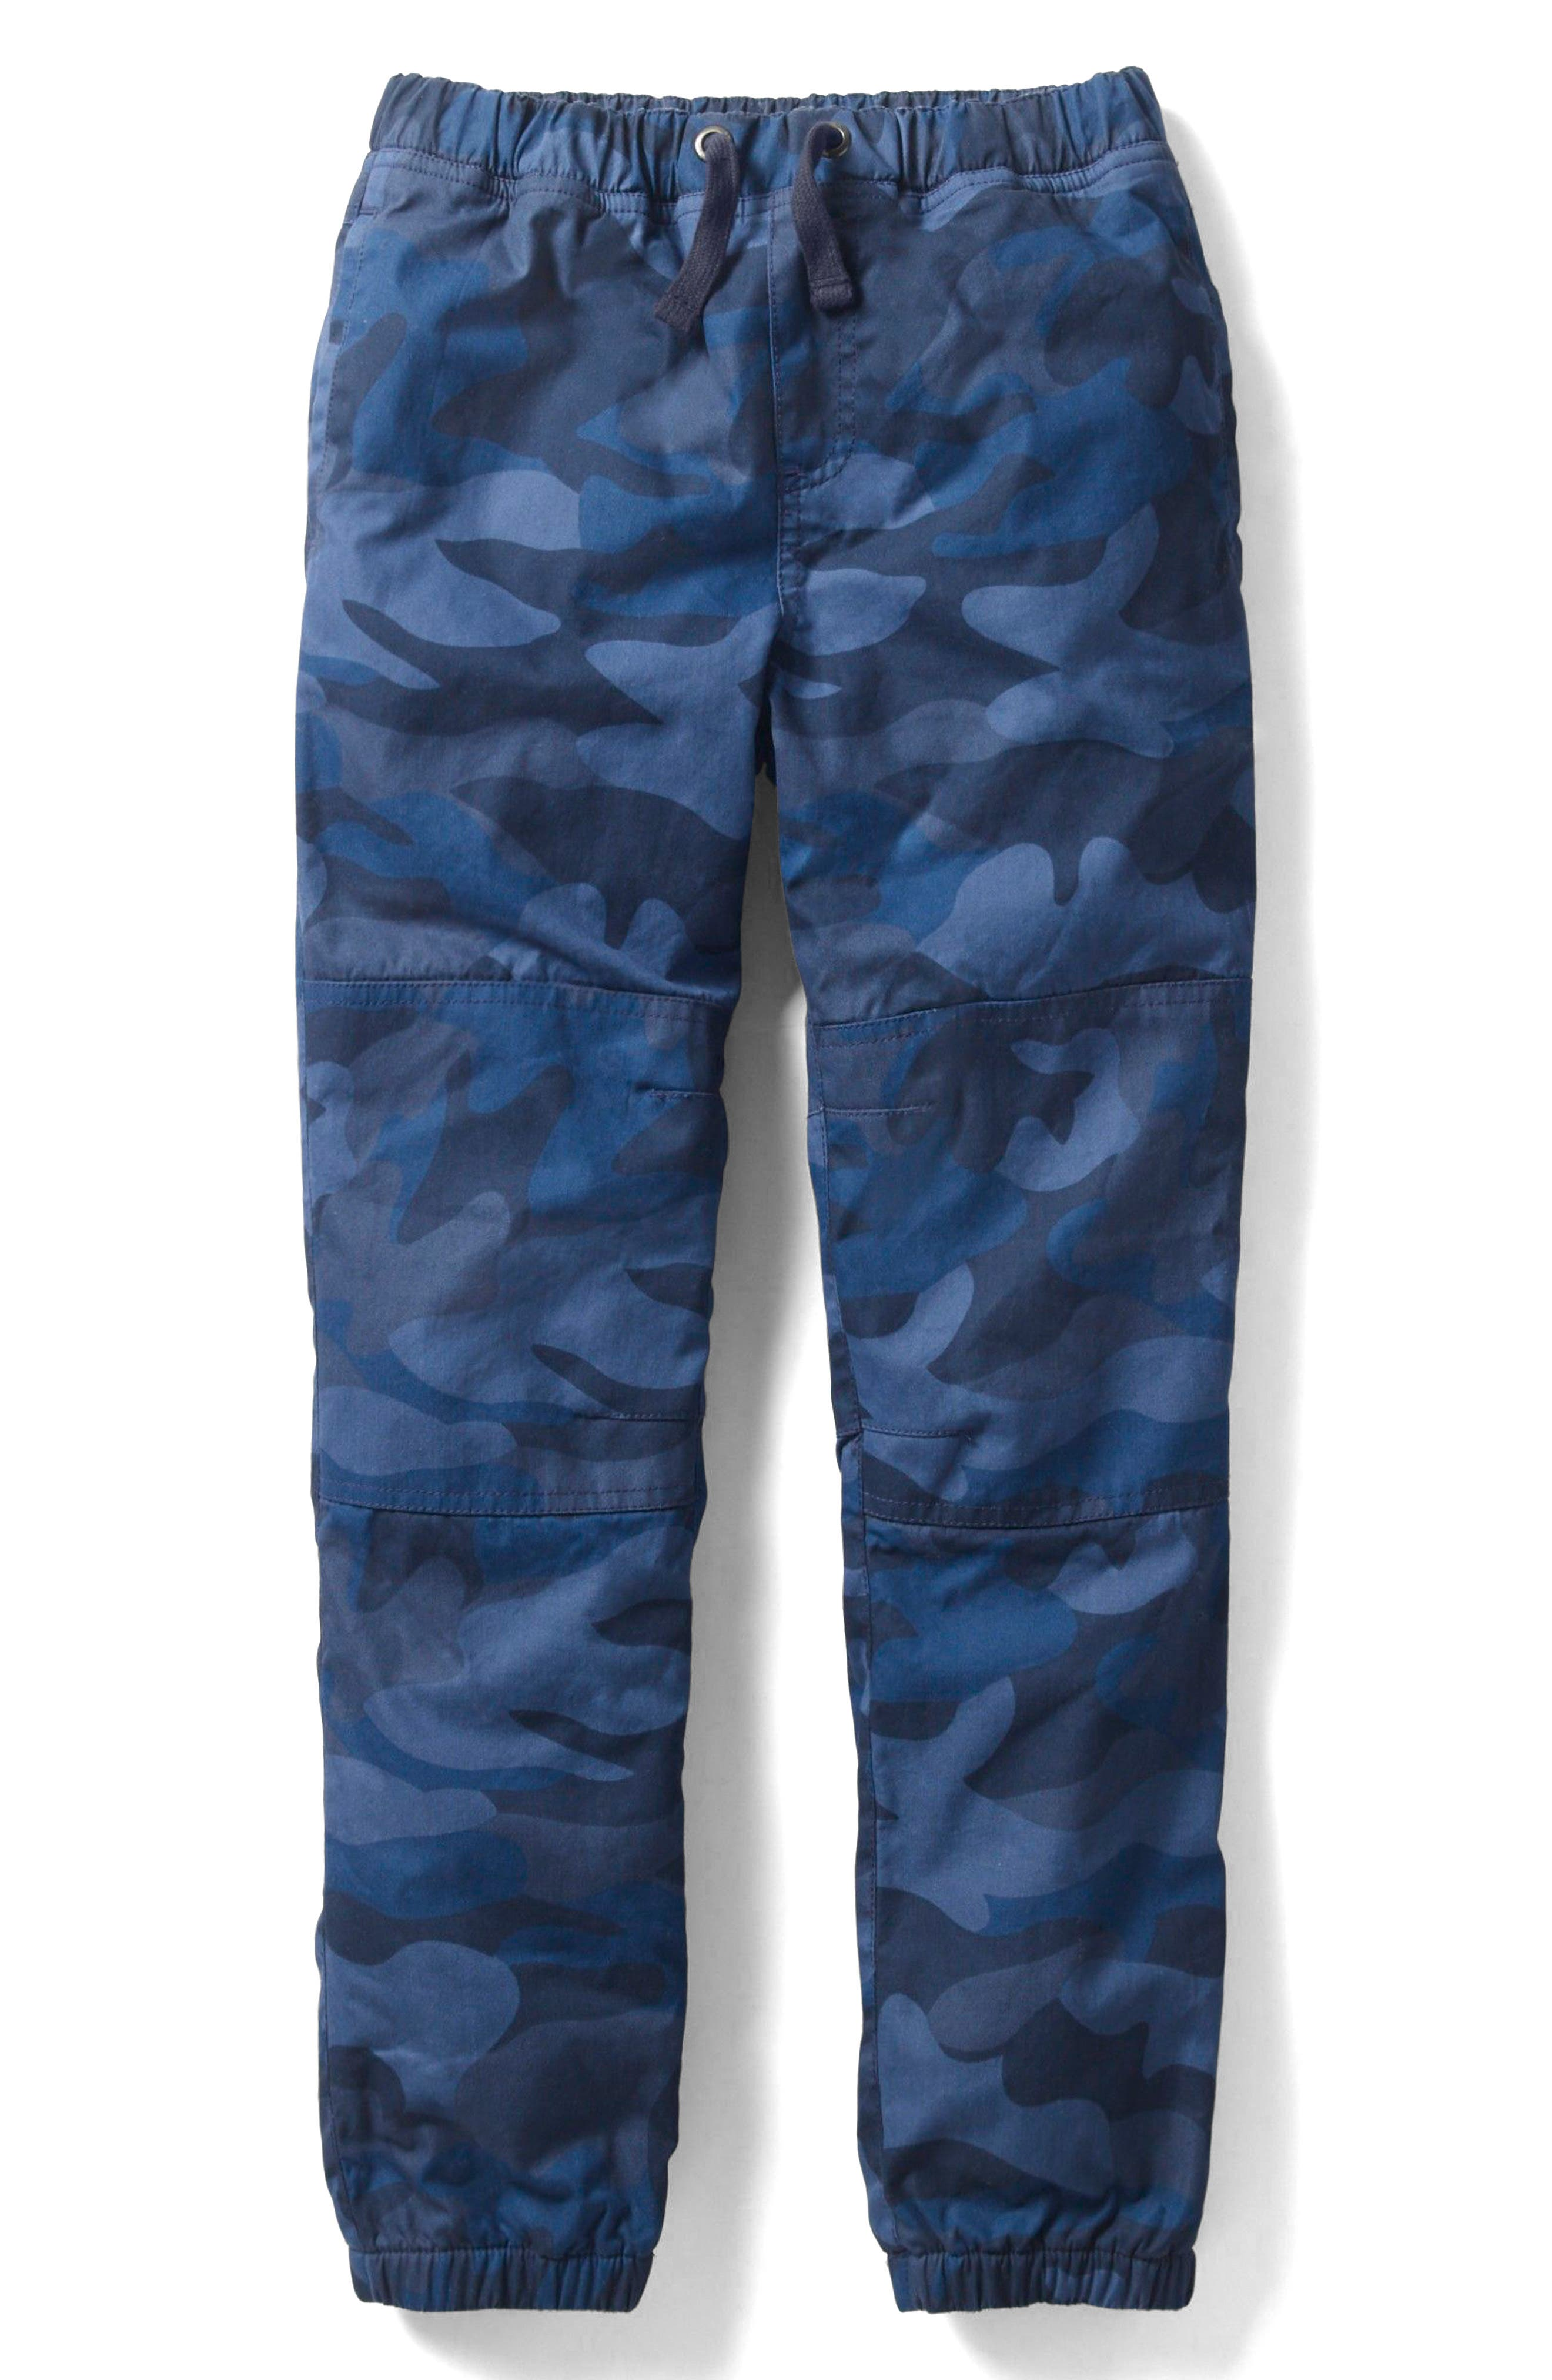 Mini Boden Fleece Lined Pants Toddler Boys, Little Boys & Big Boys)